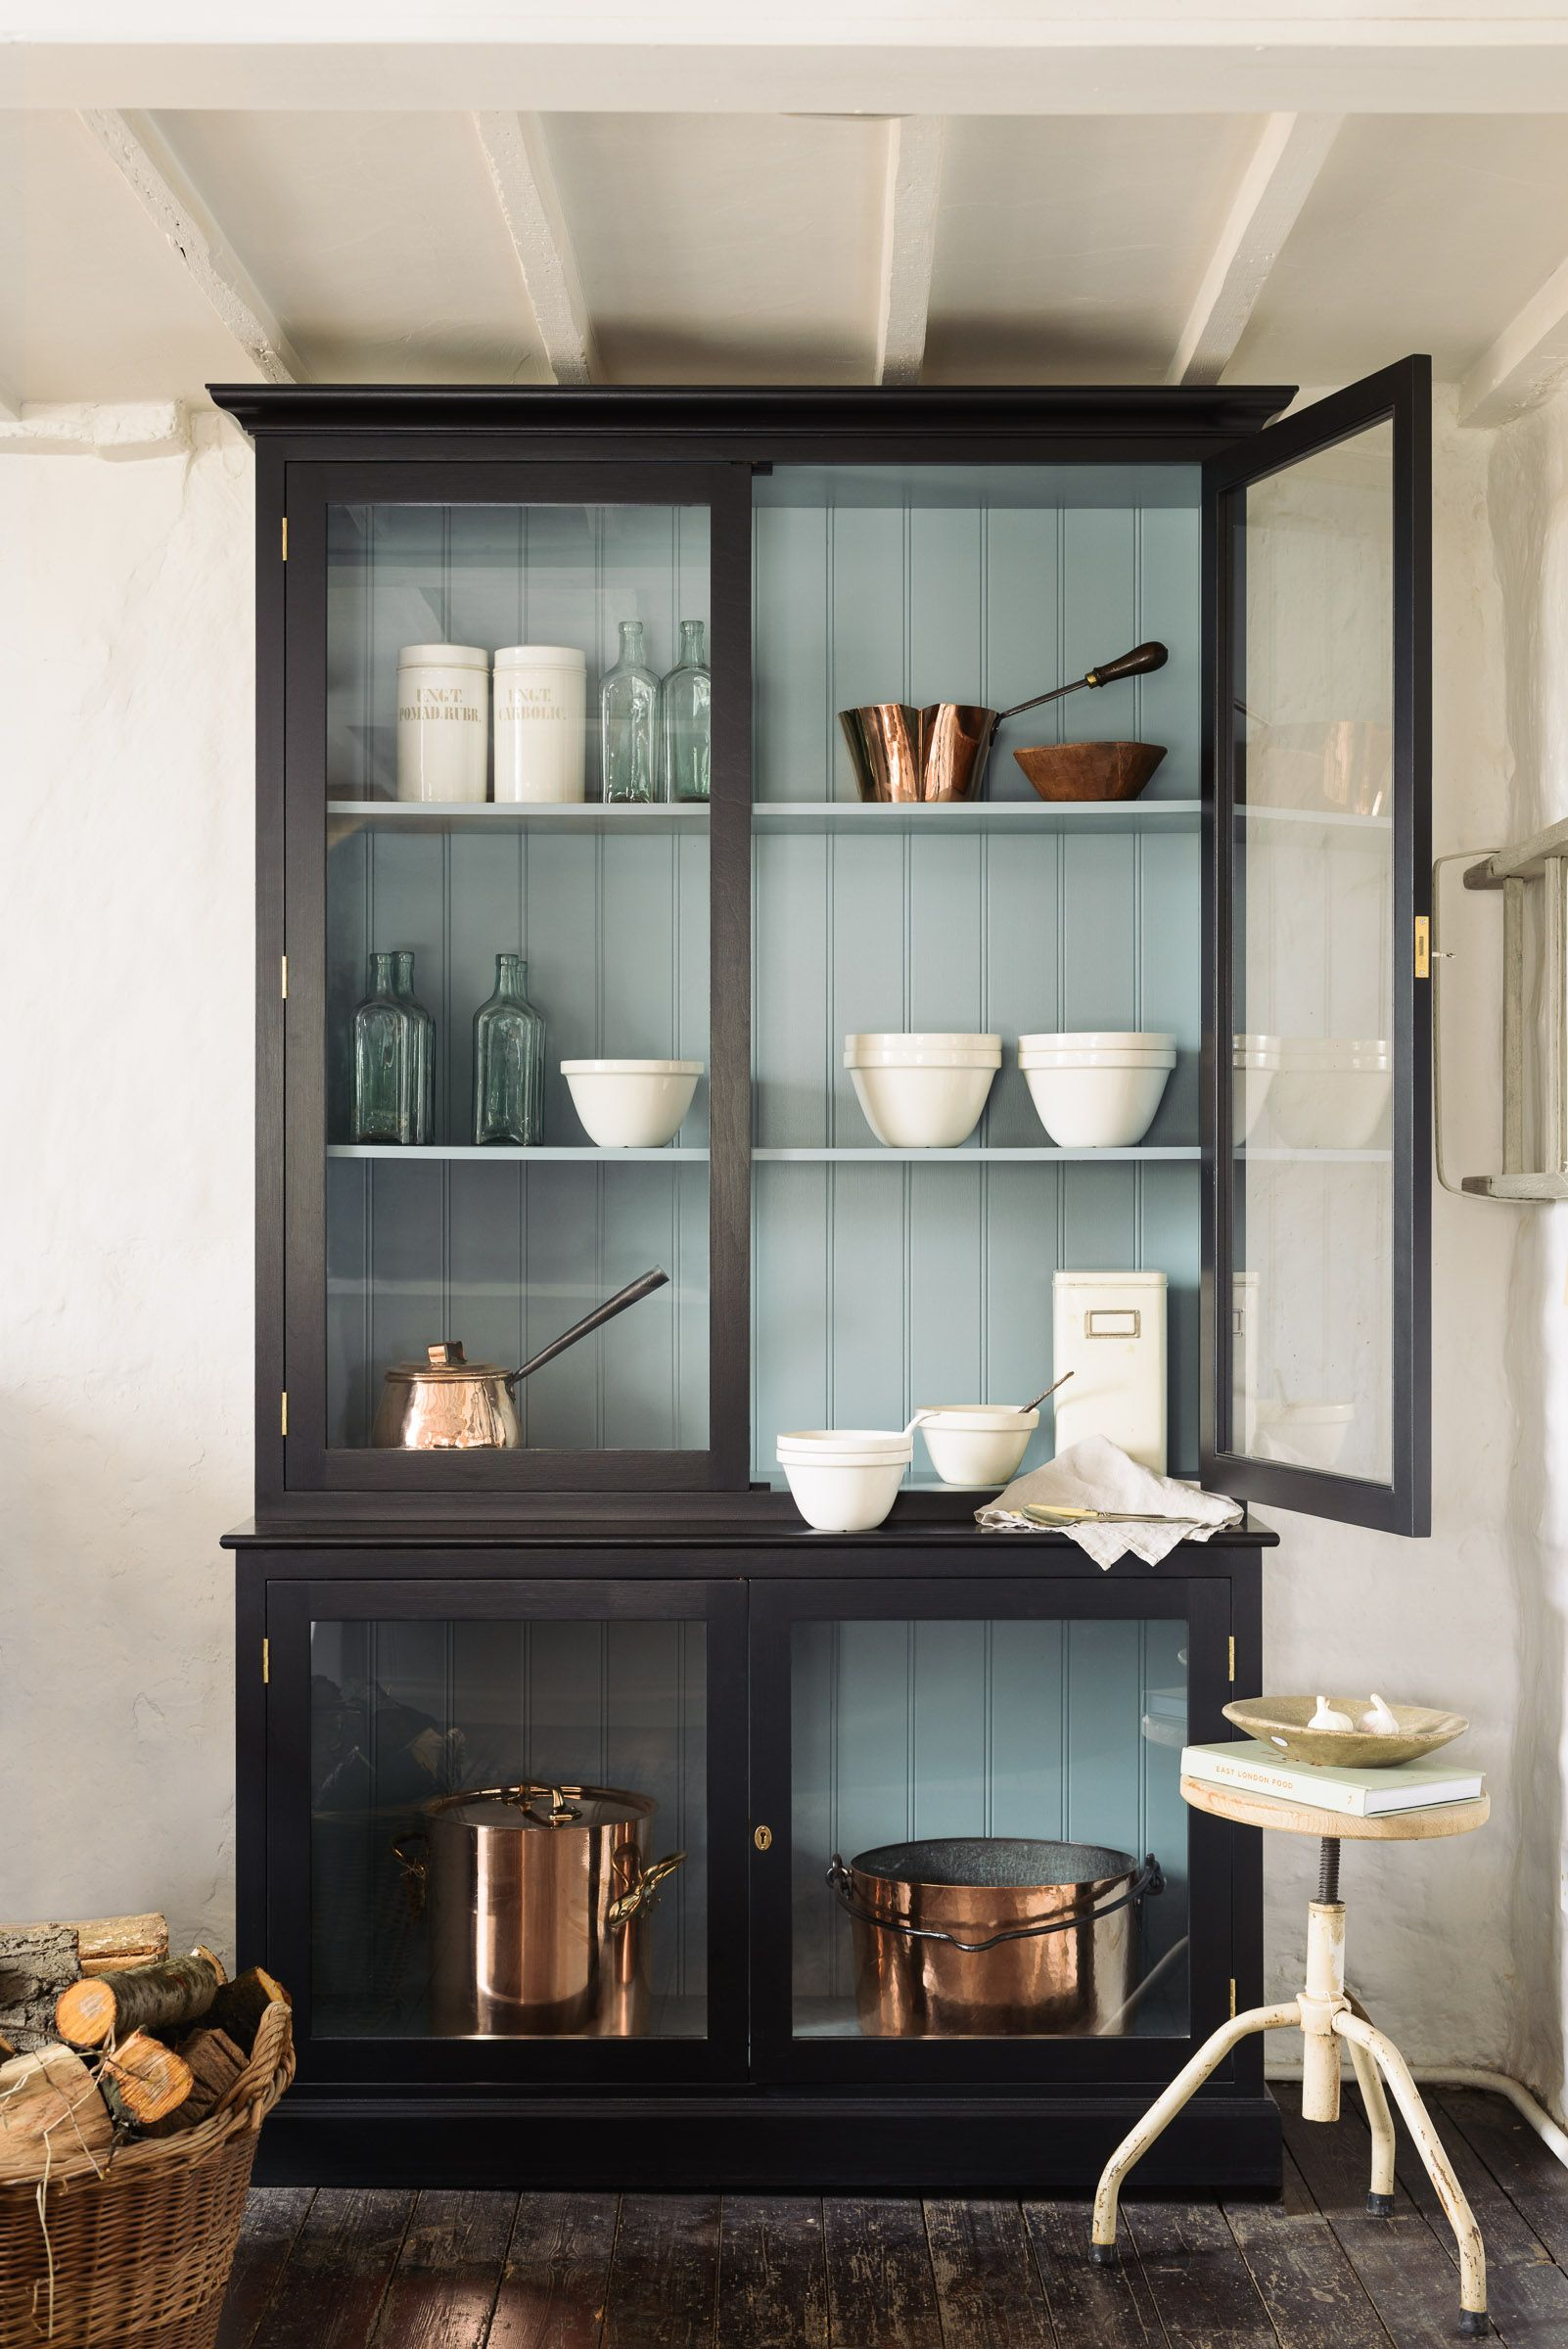 Kitchen Cabinet Display Roundhouse Nightingale Cabinet Bespoke Kitchen Kitchens